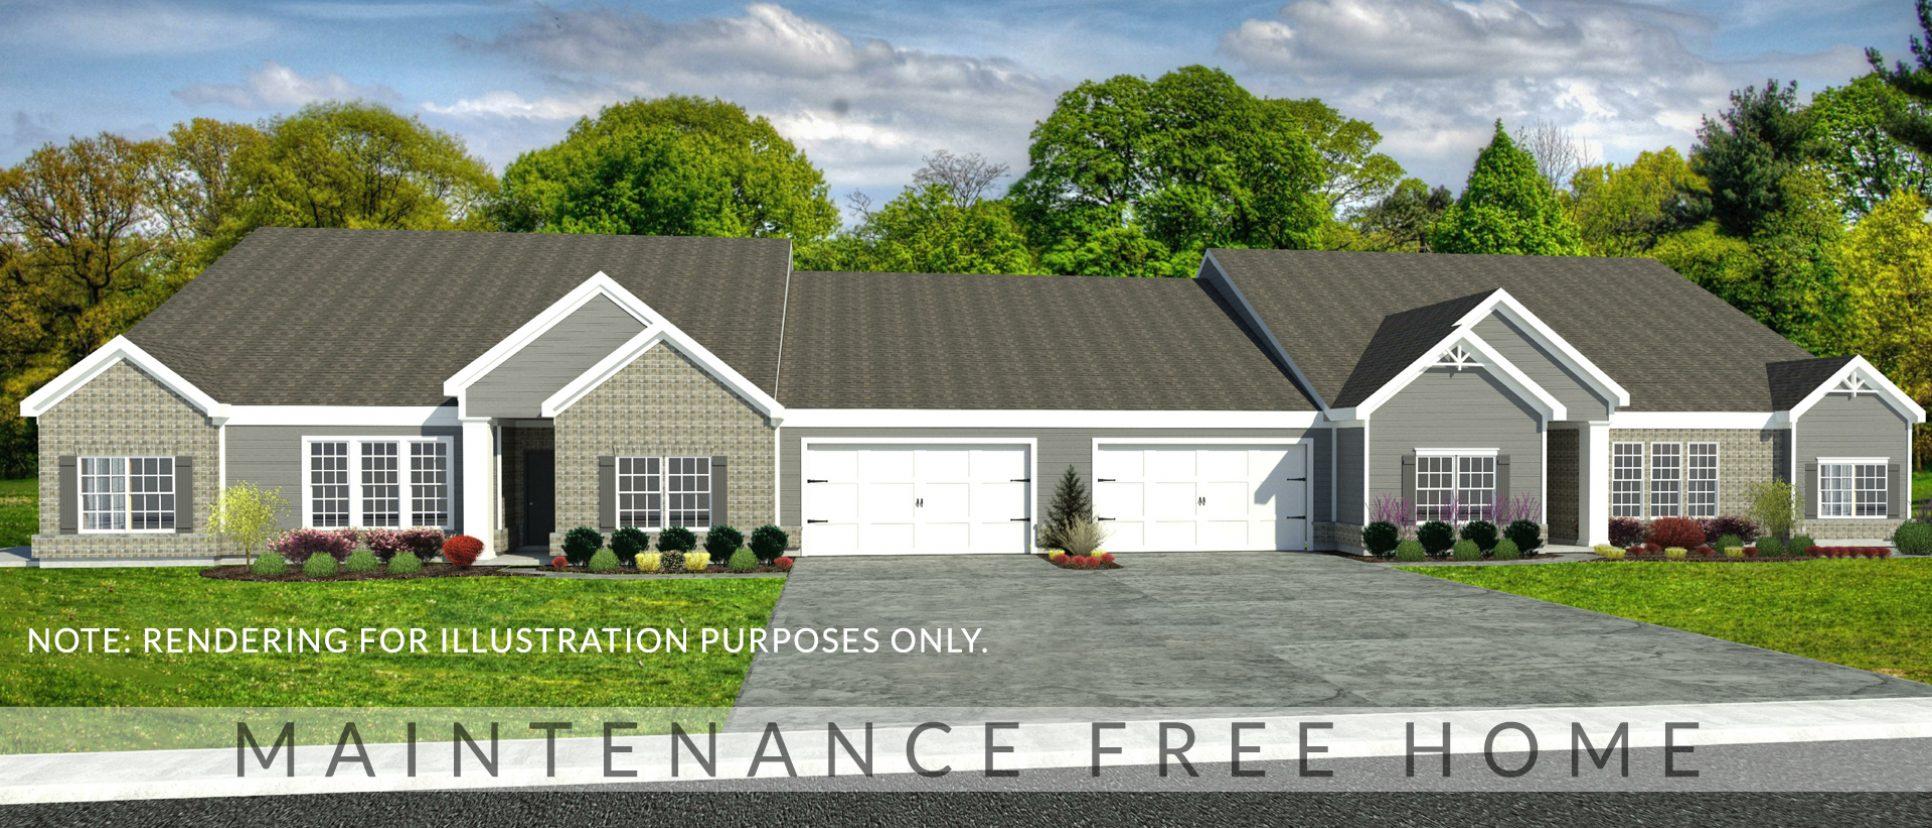 Exterior rendering of The Abbington. A condo in Soraya Farms, custom built by Design Homes and Development.